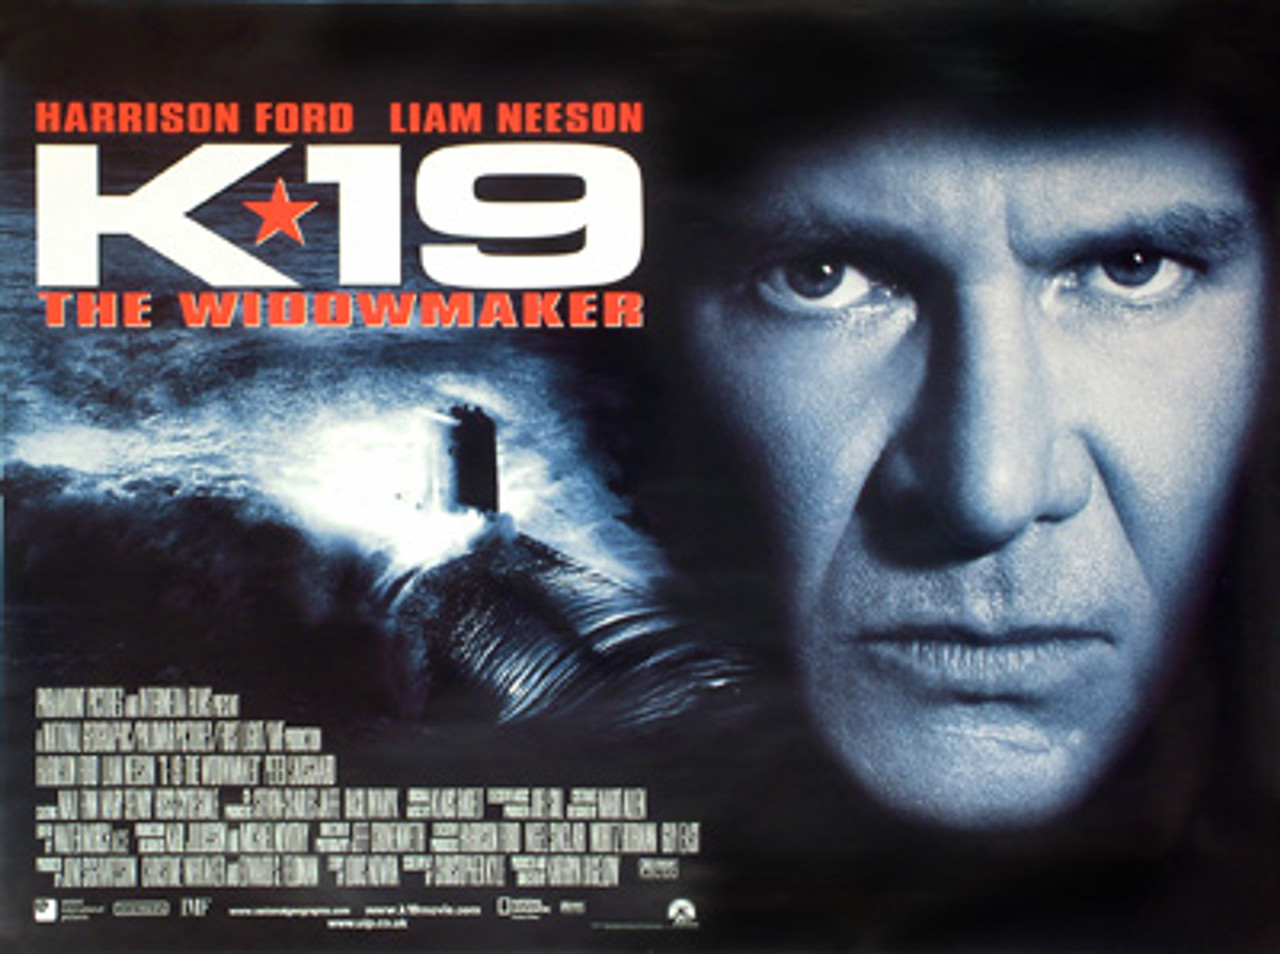 K-19: THE WIDOWMAKER POSTER buy movie posters at Starstills.com ...